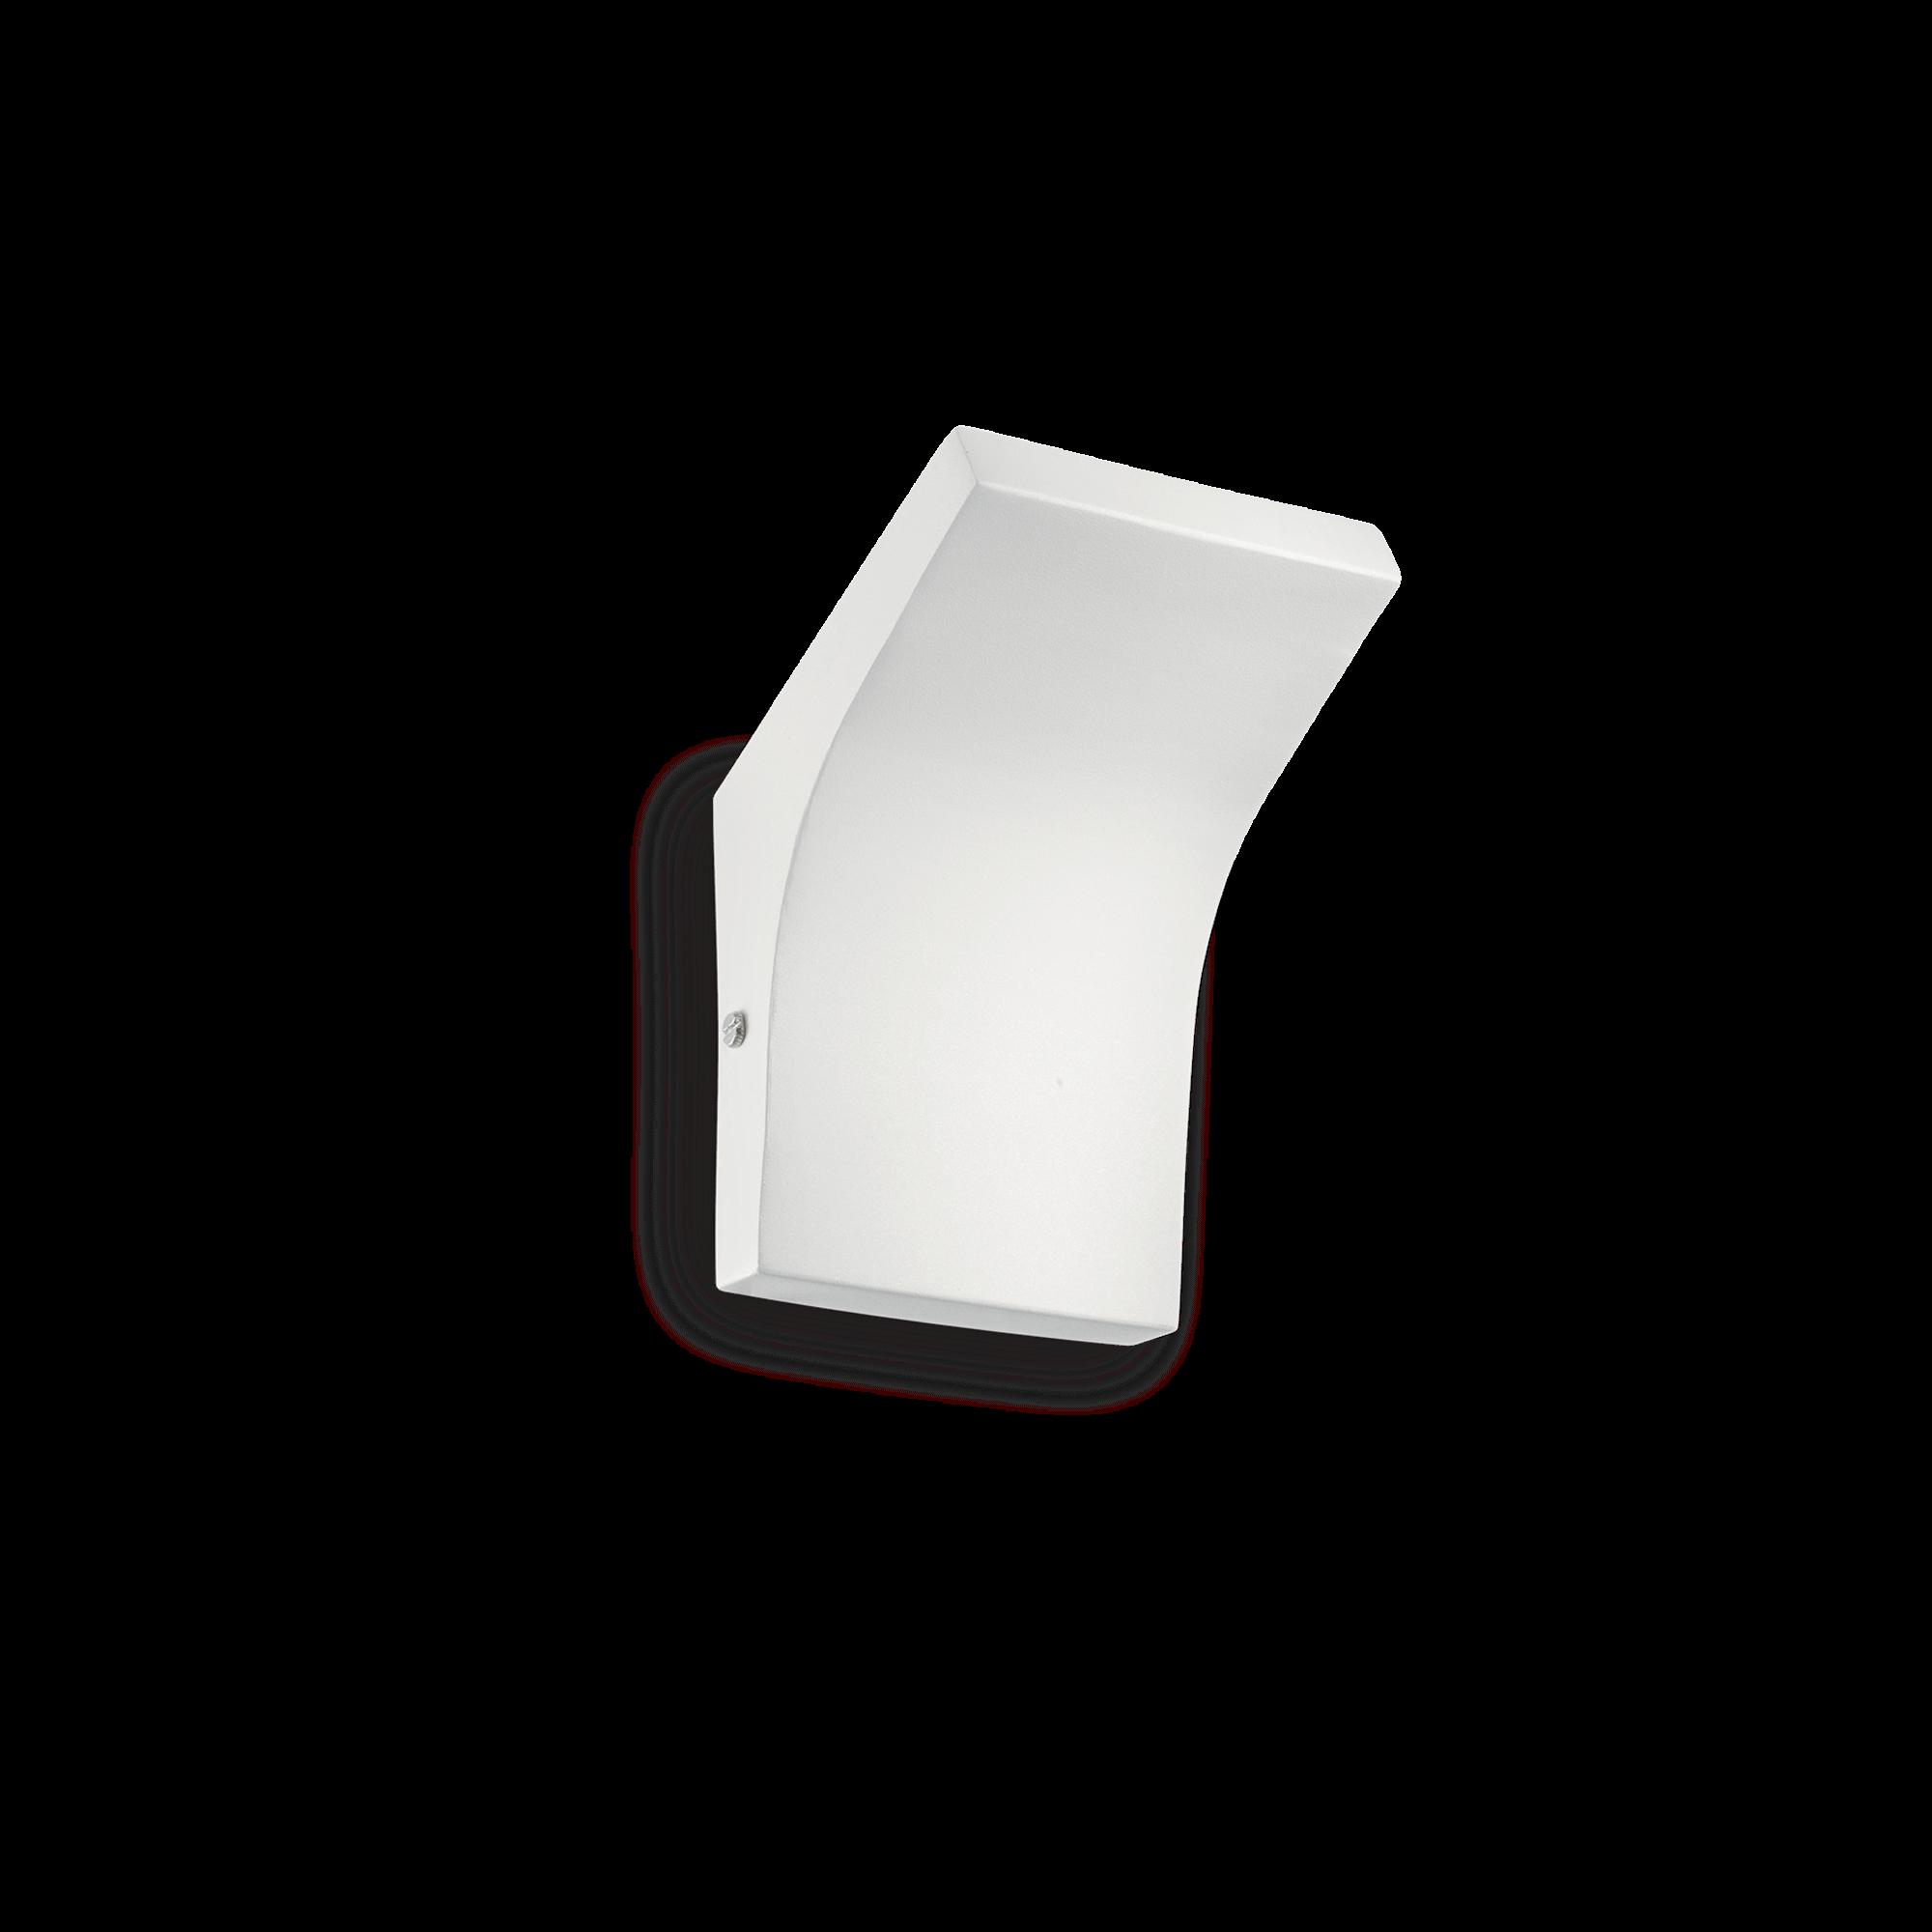 Ideal Lux 125886 COMMODORE AP1 falikar